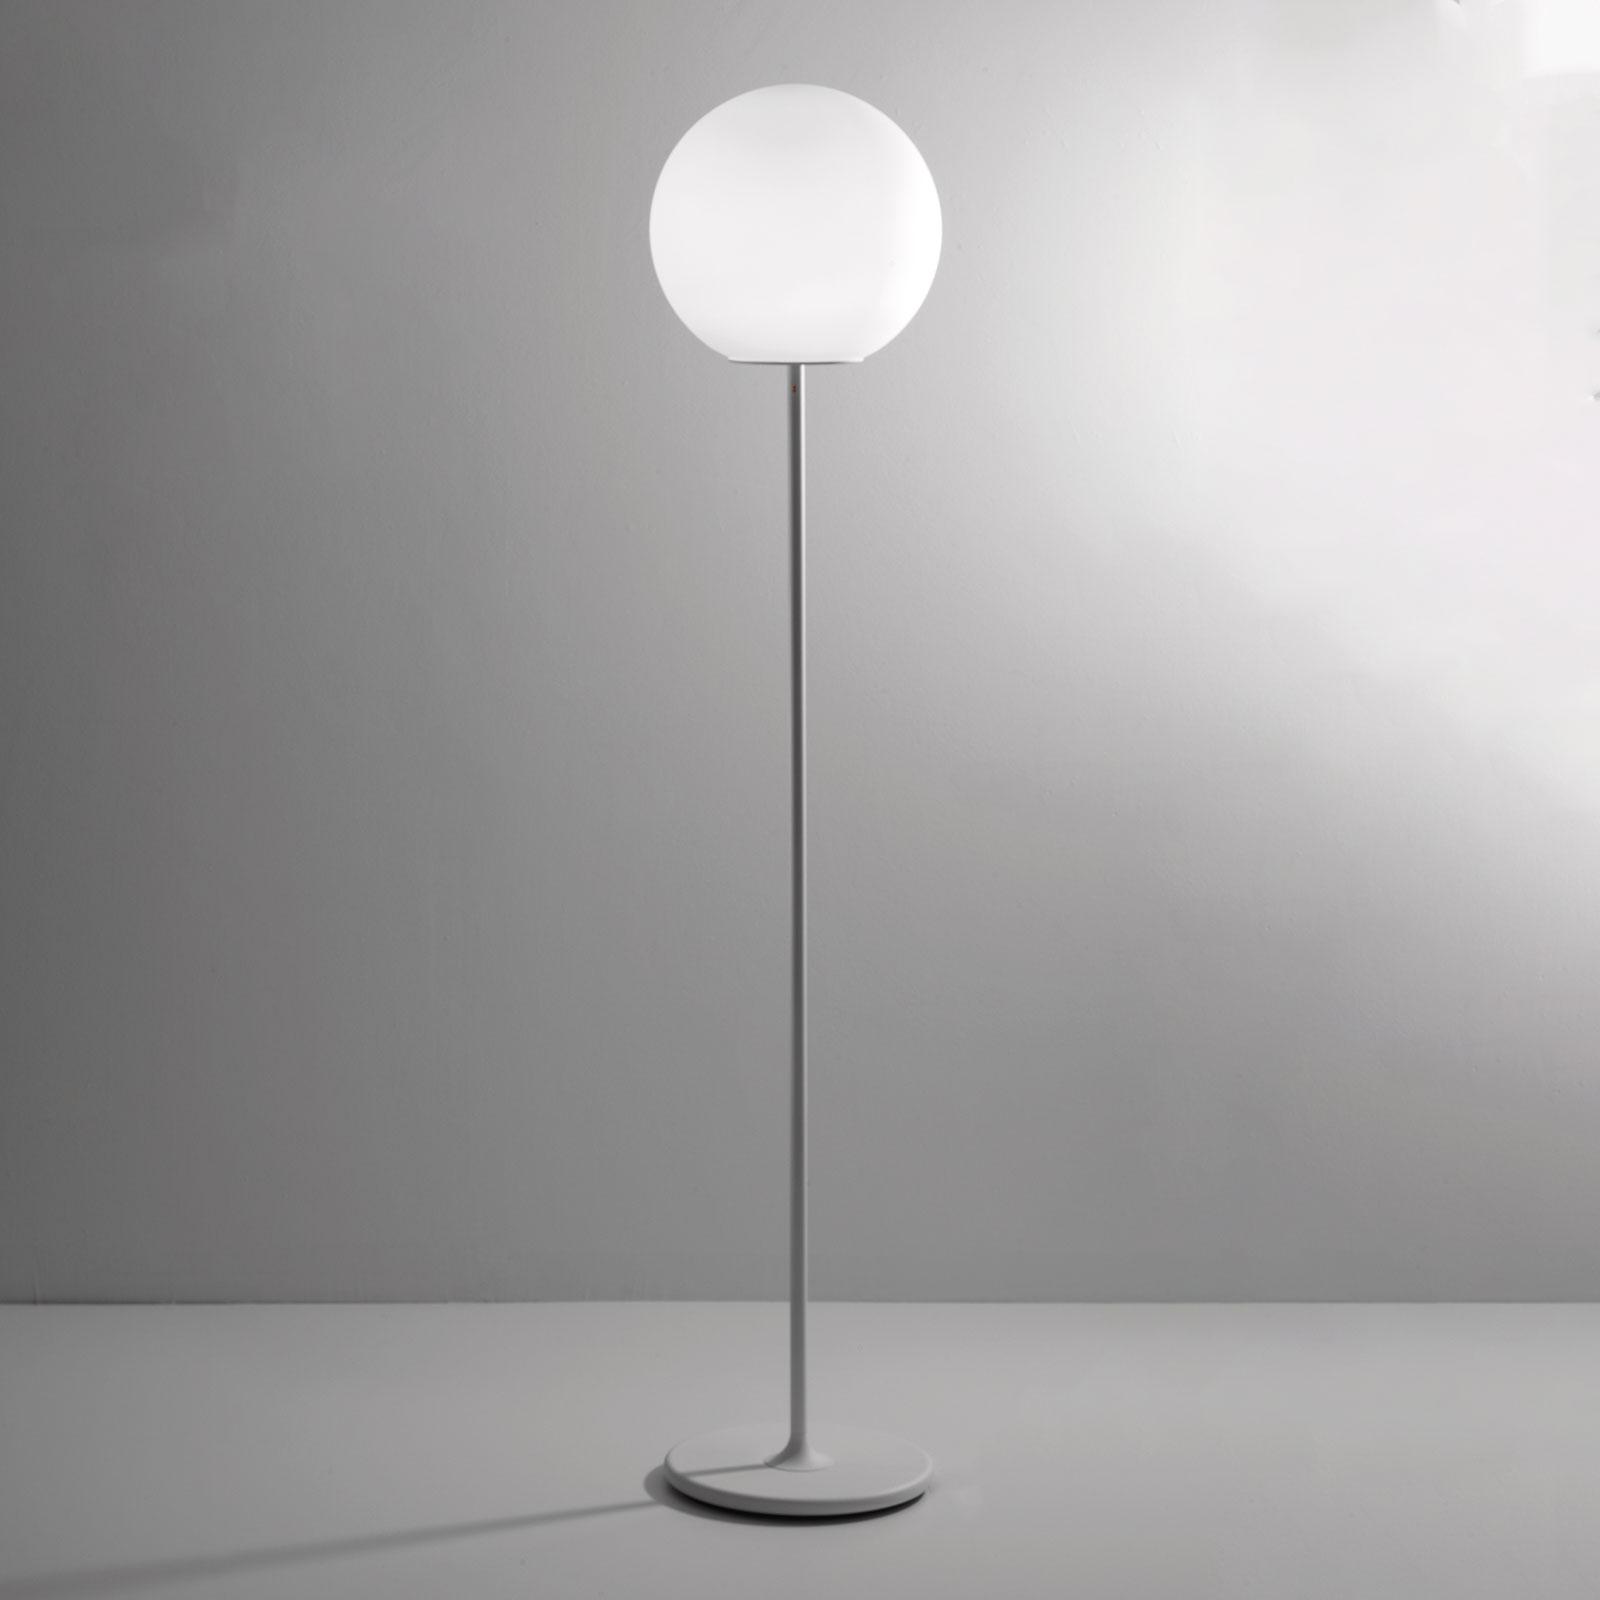 Fabbian Lumi Sfera lampadaire en verre, Ø 35cm